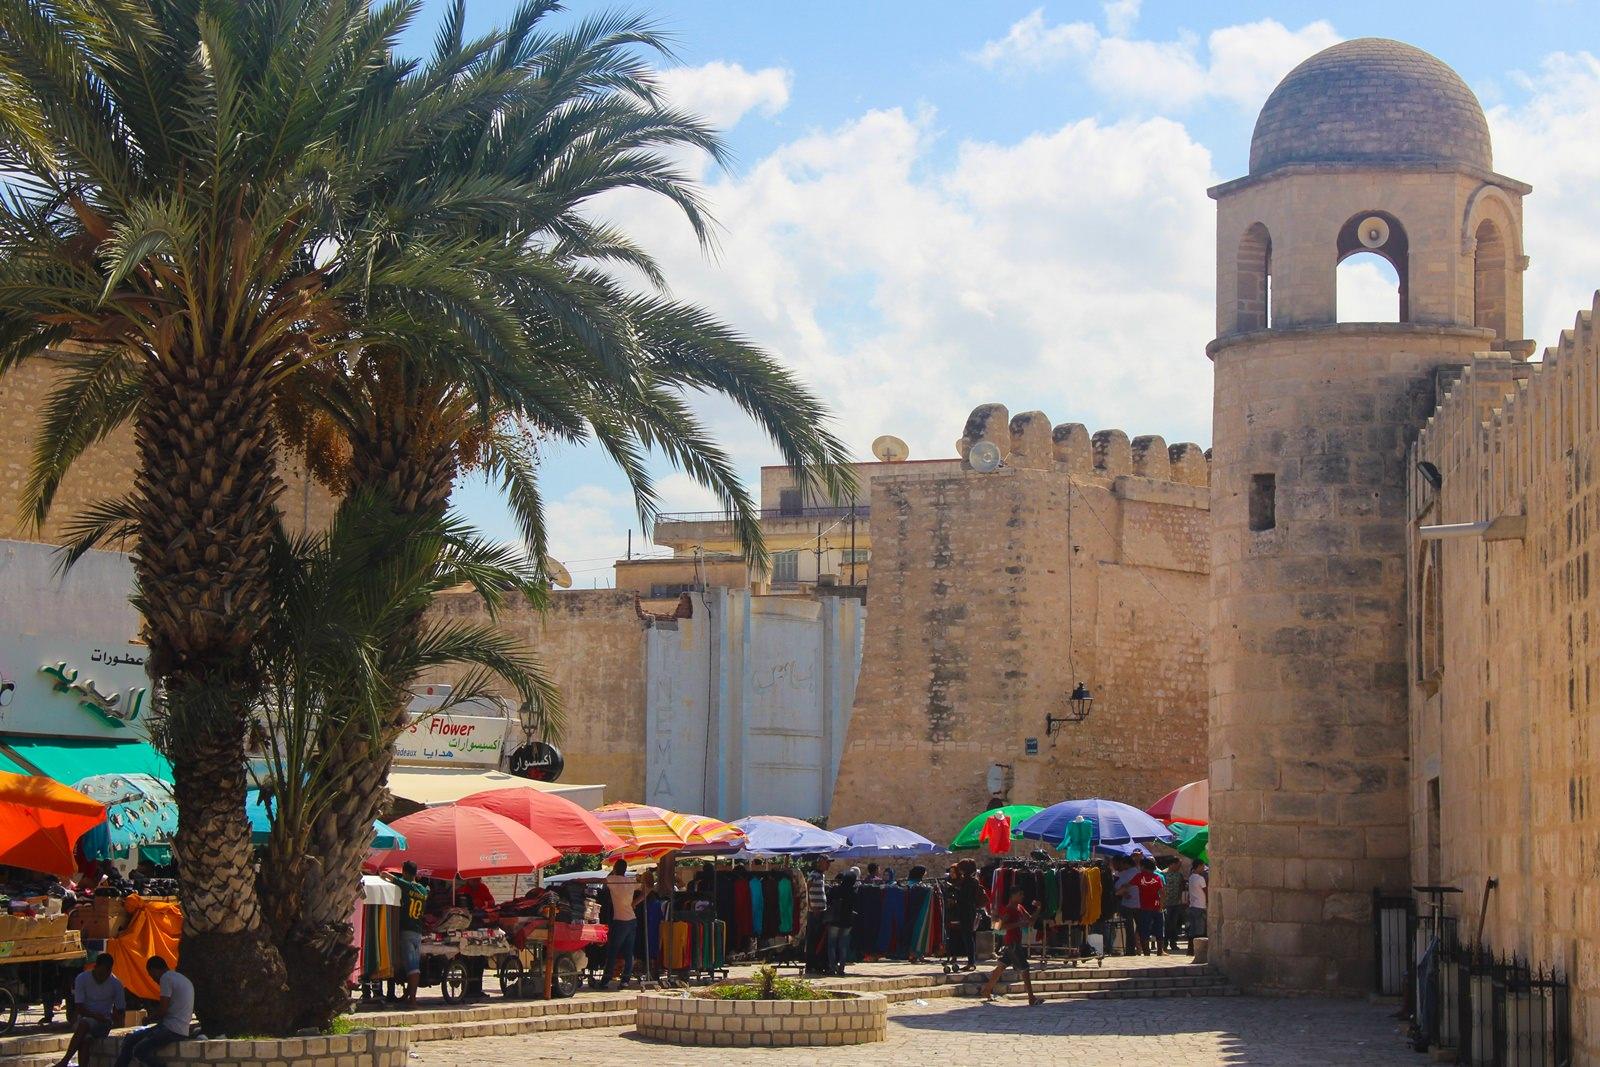 Bazar in Sousse